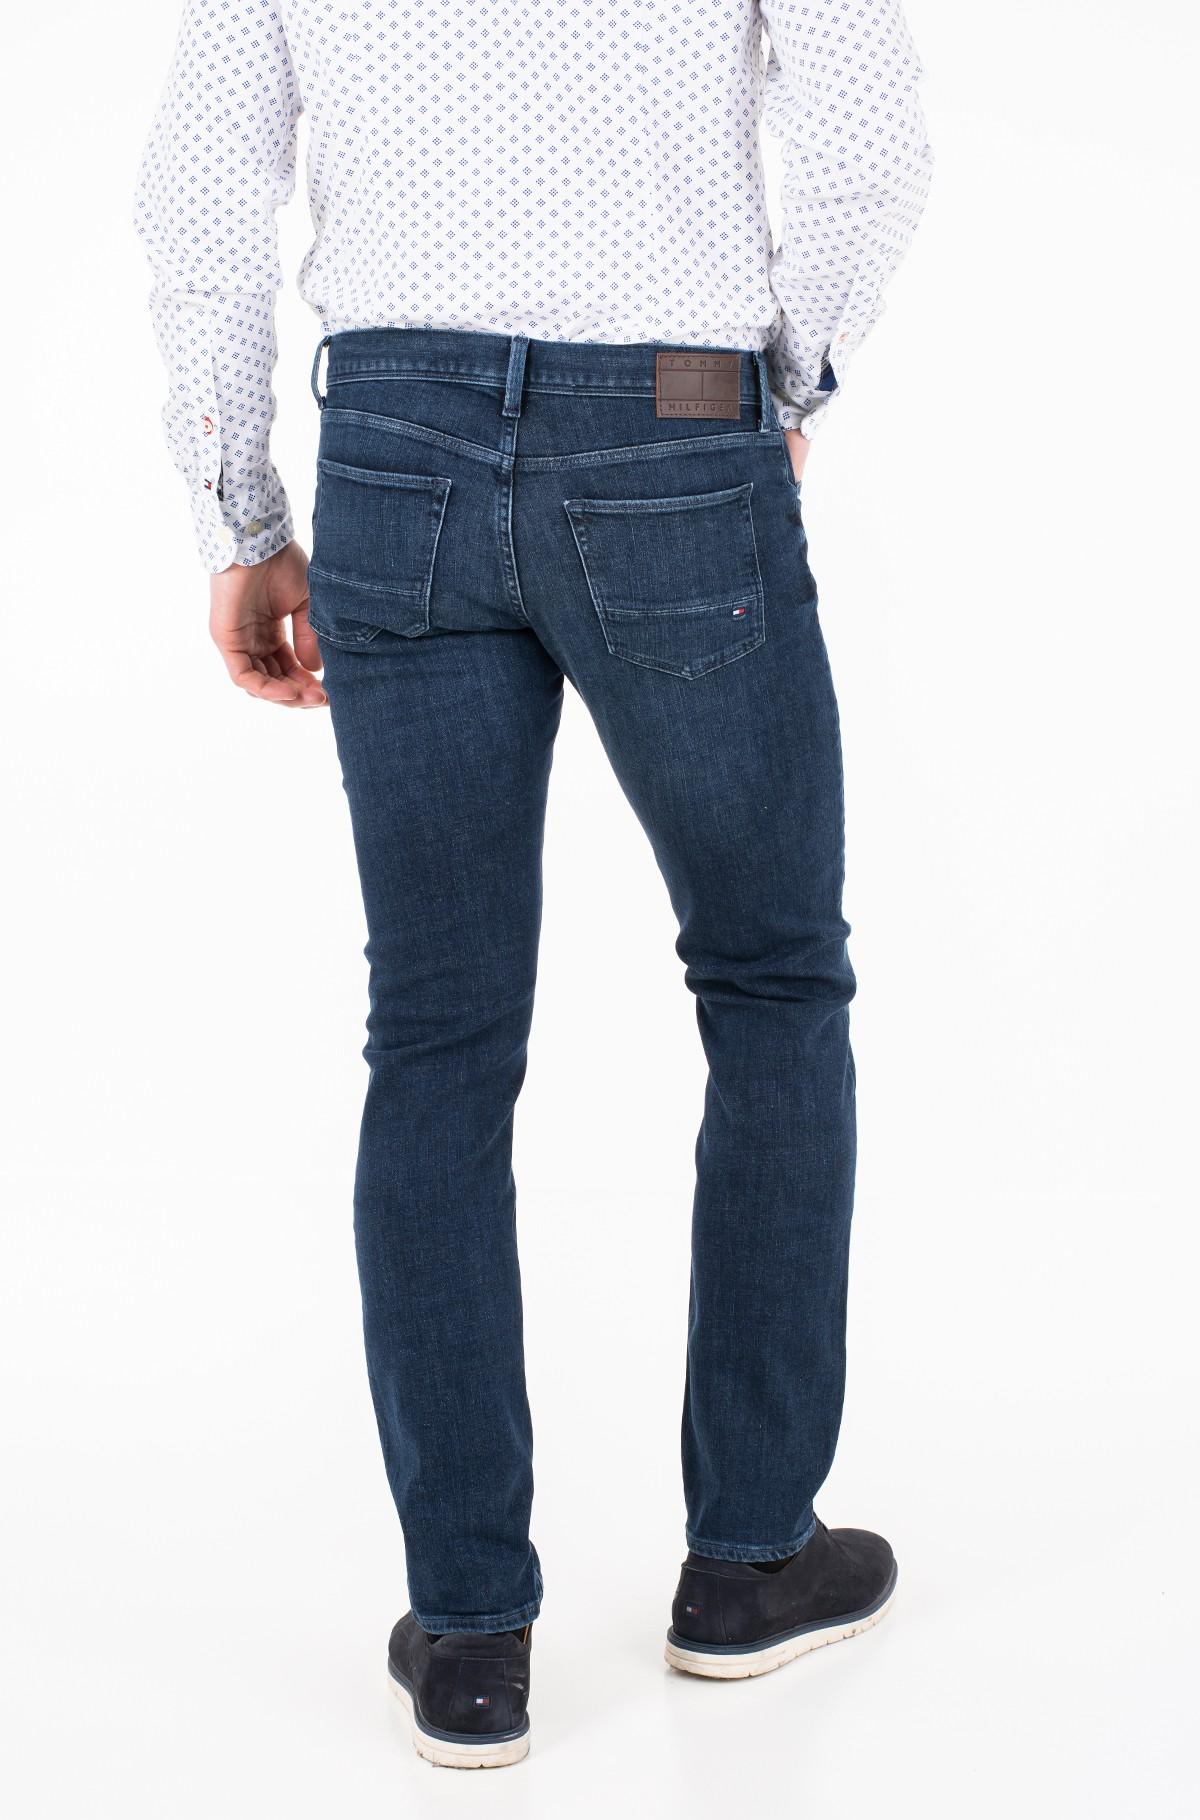 Džinsinės kelnės SLIM BLEECKER PSTR ENAN BLUE-full-2